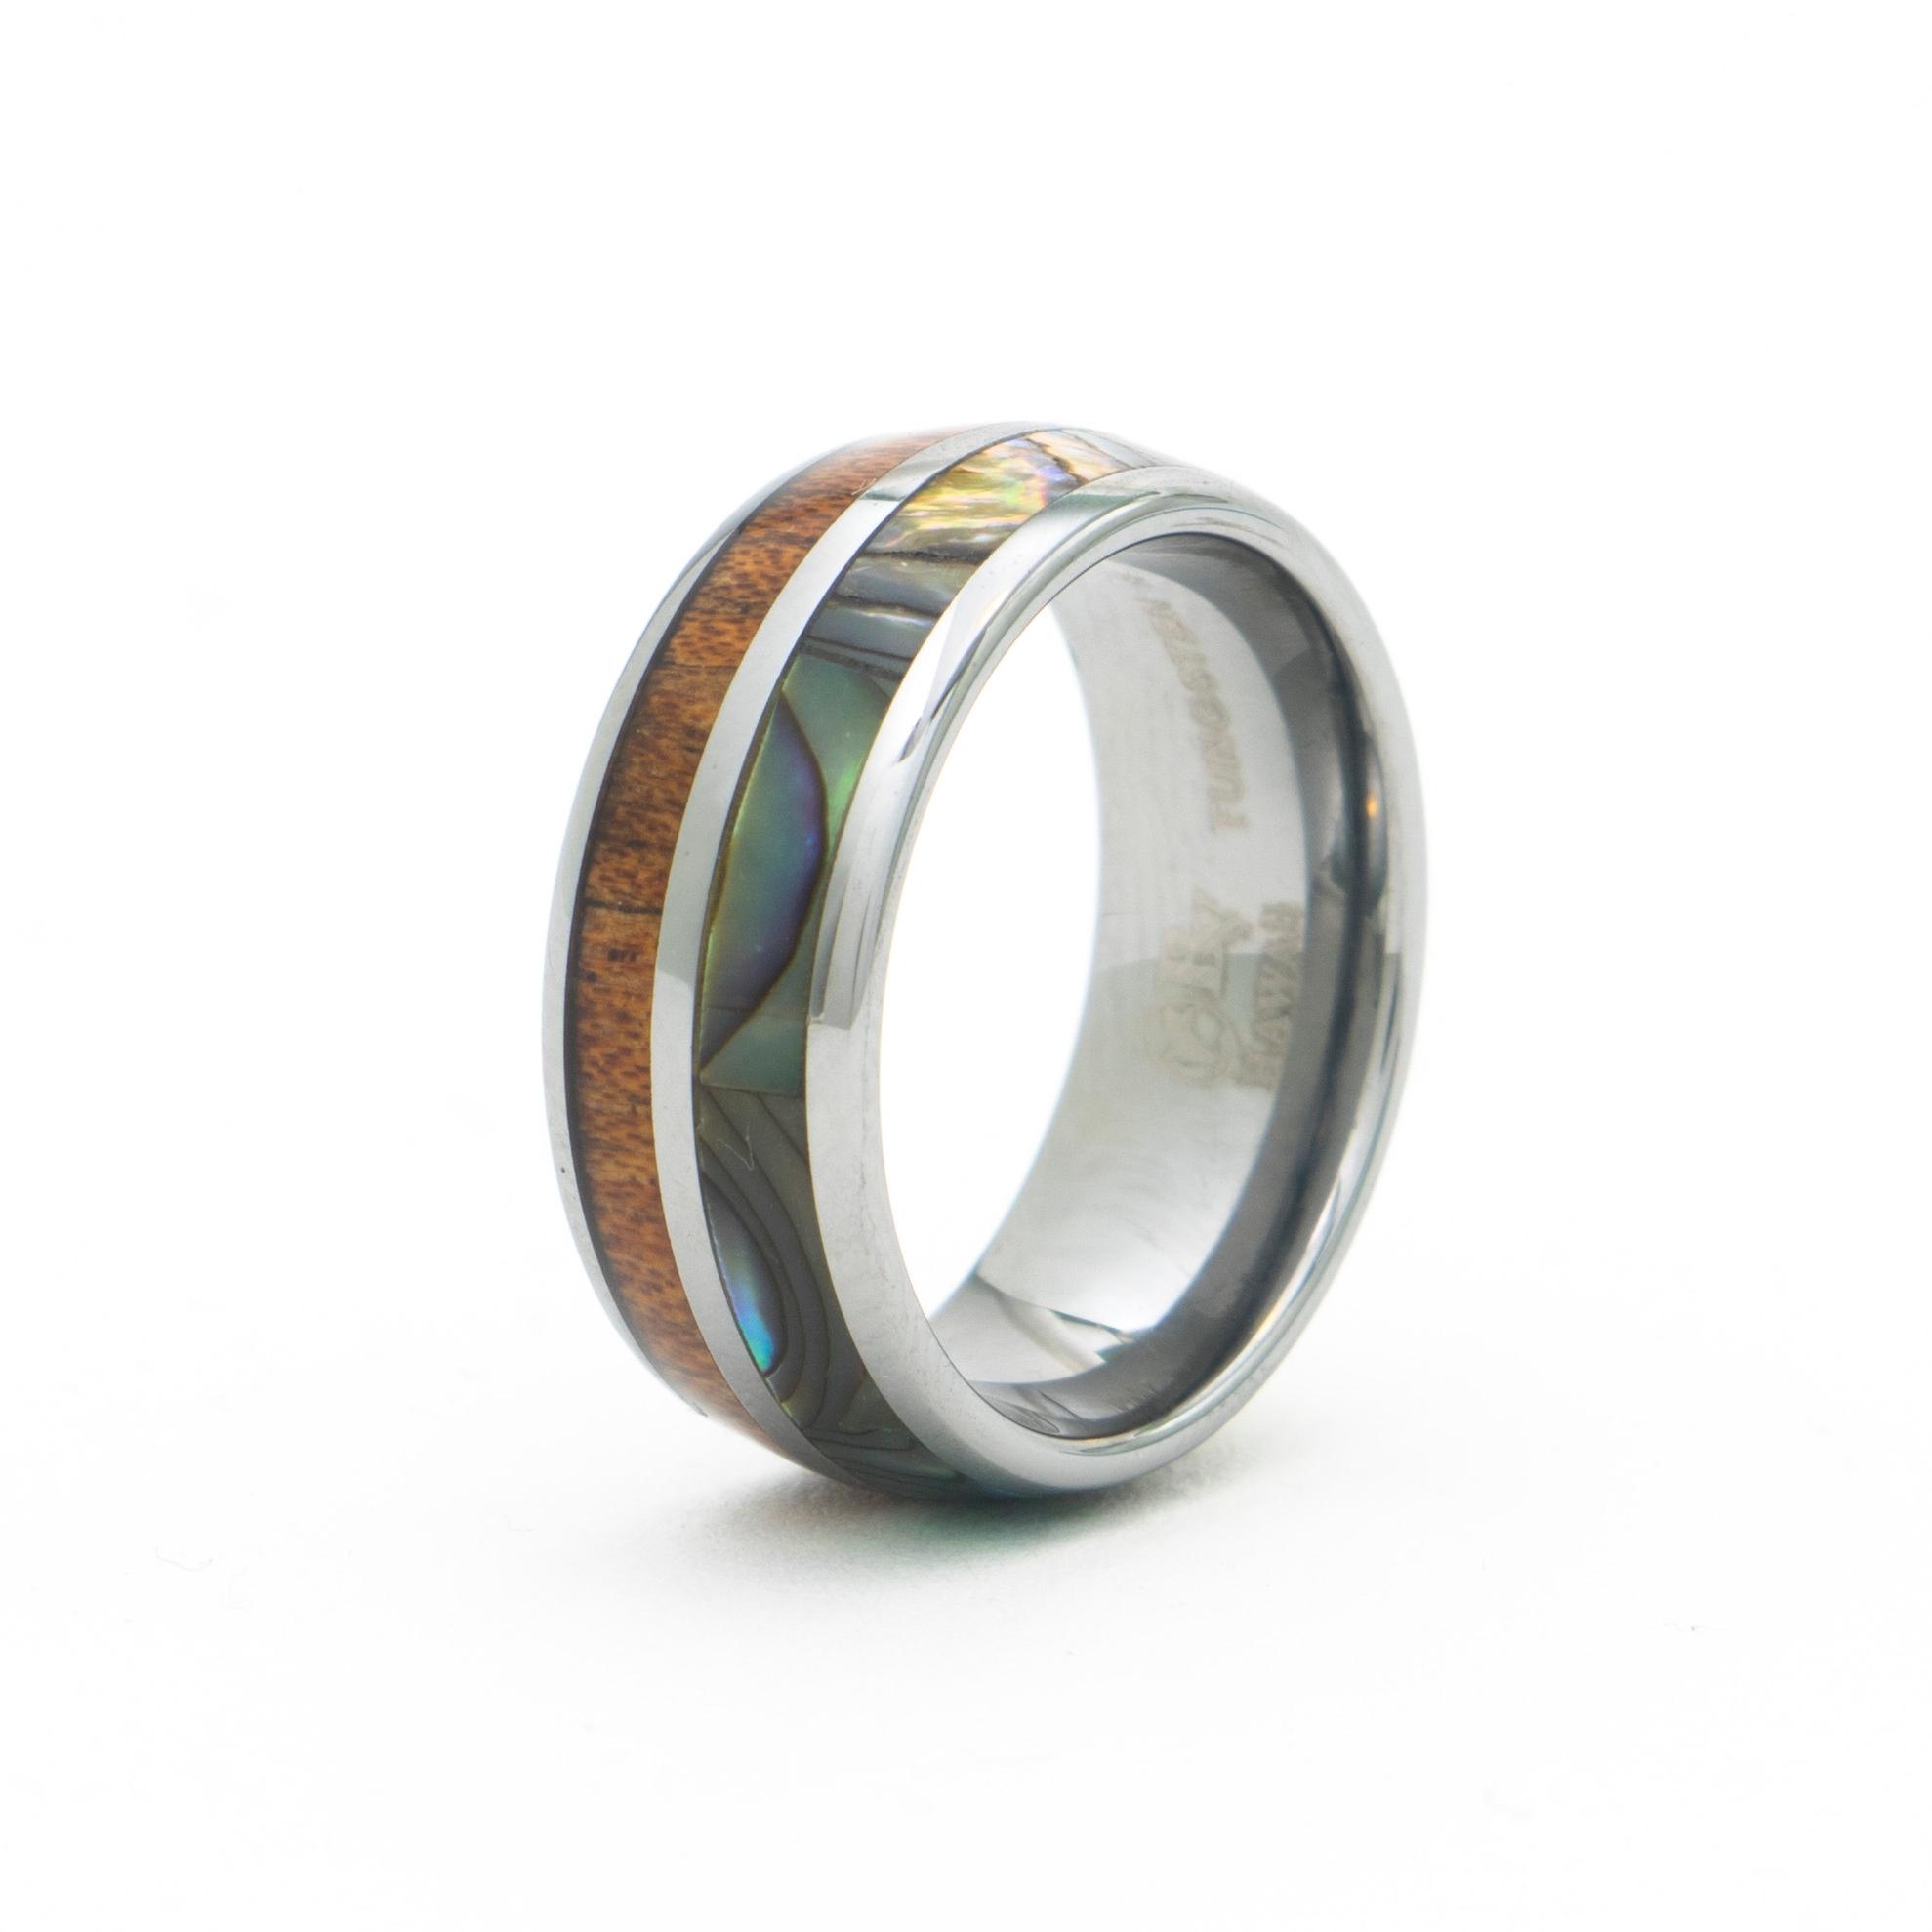 Koa Wood Abalone Shell Ring